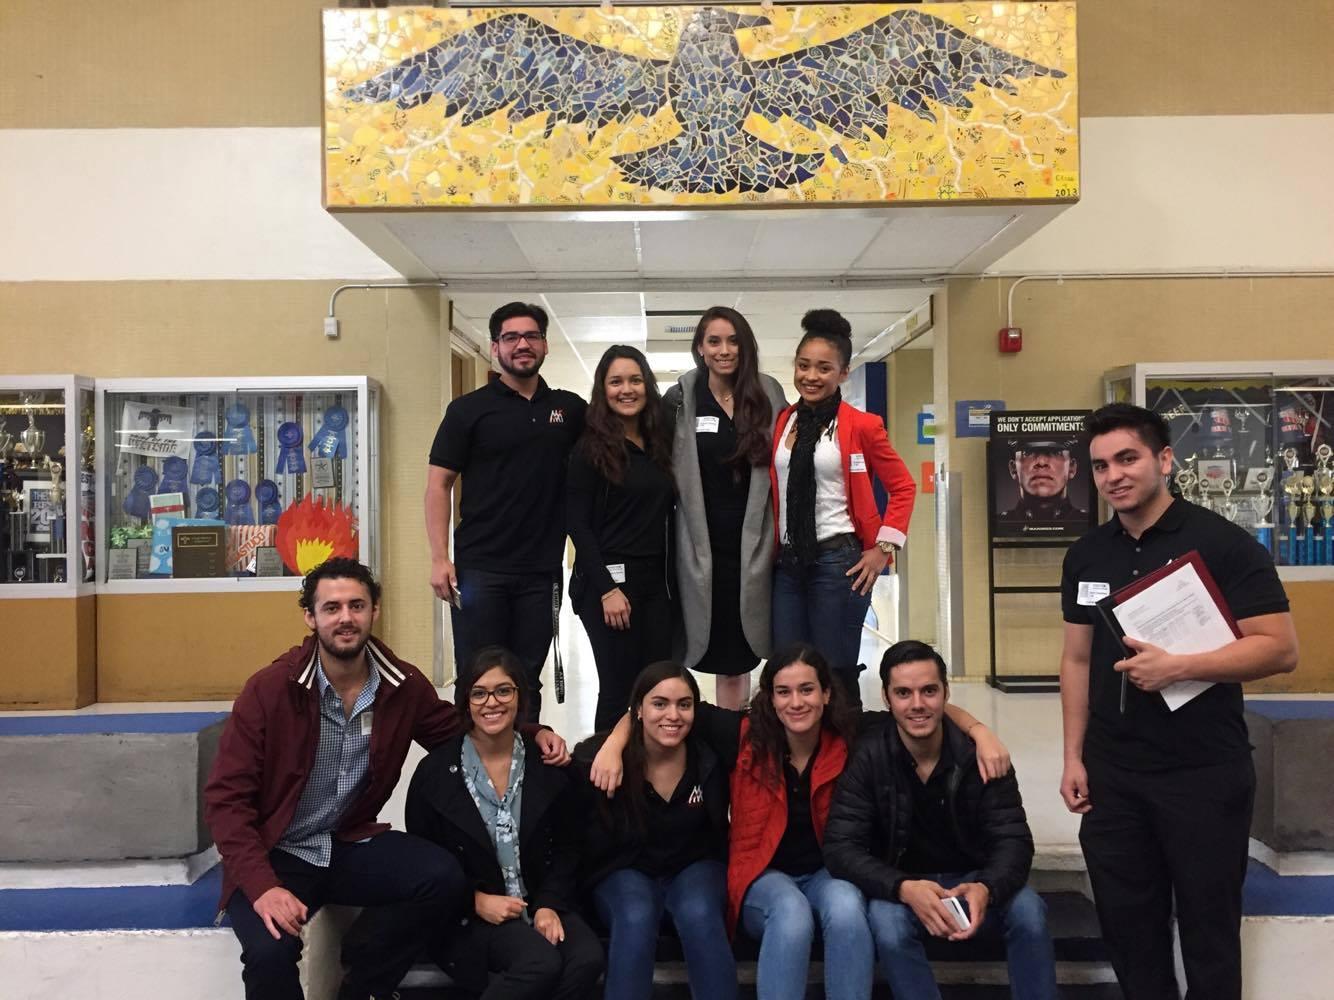 AMA'ers at Coronado High School